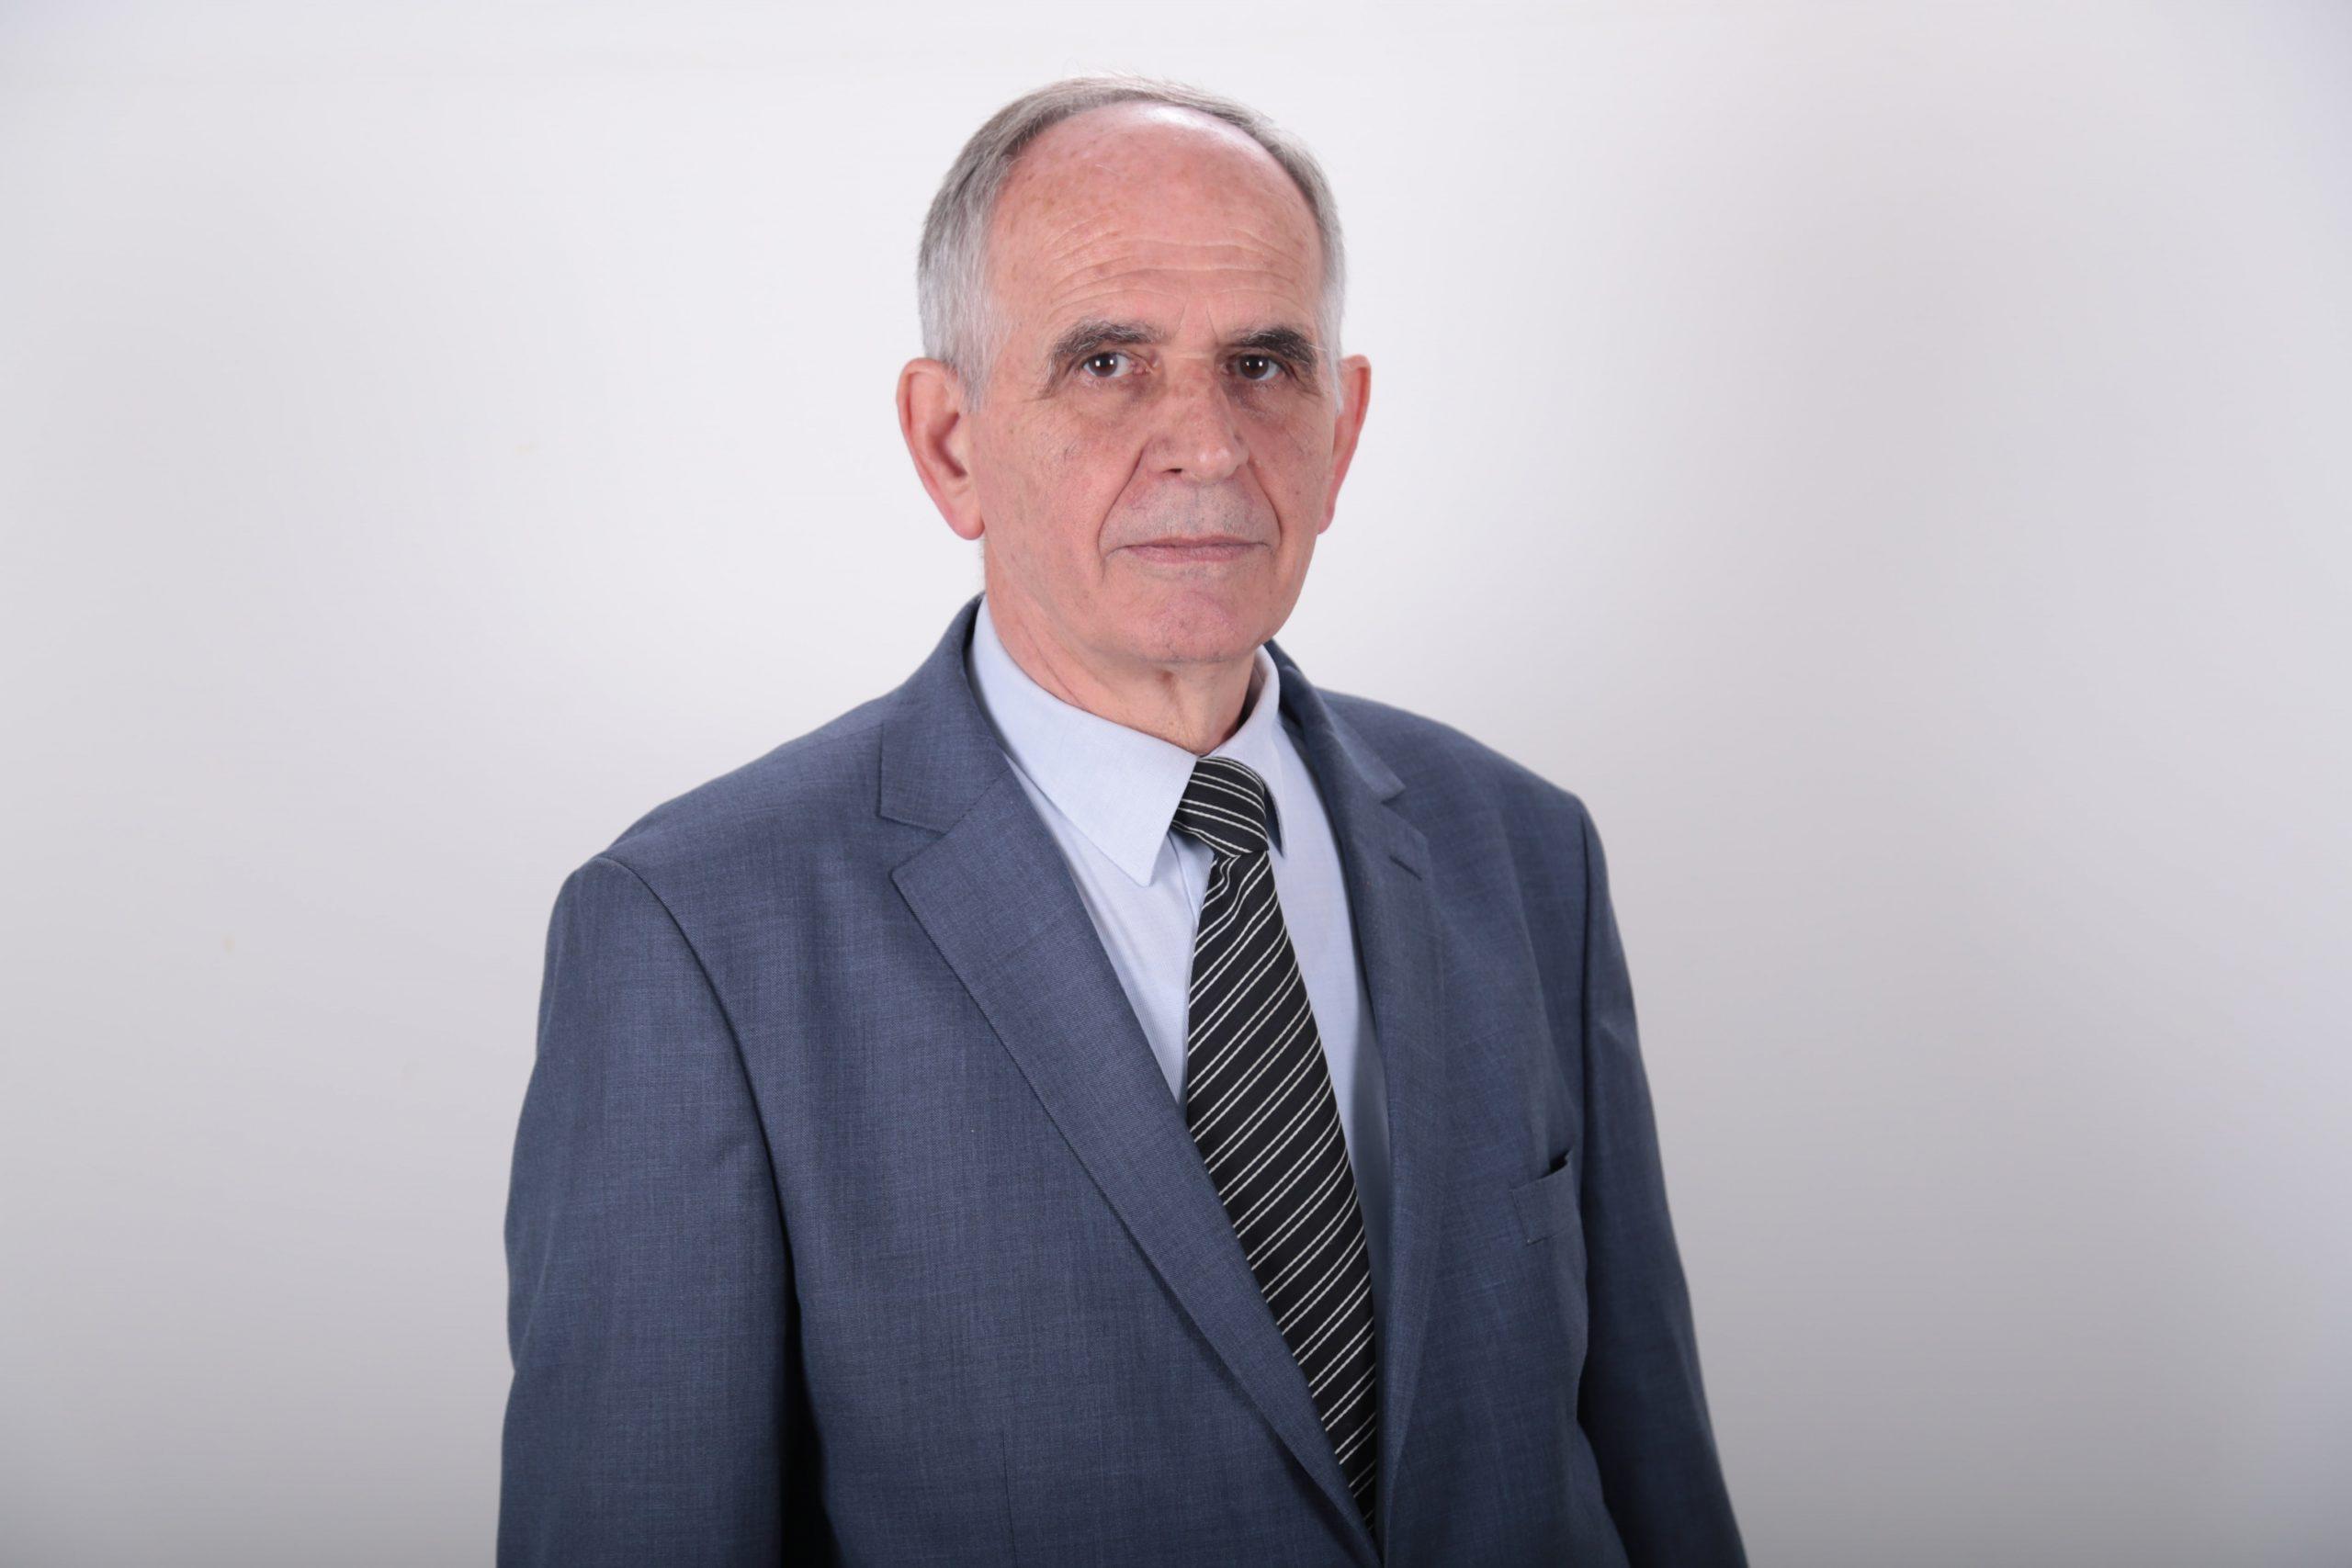 Salih Krasniqi